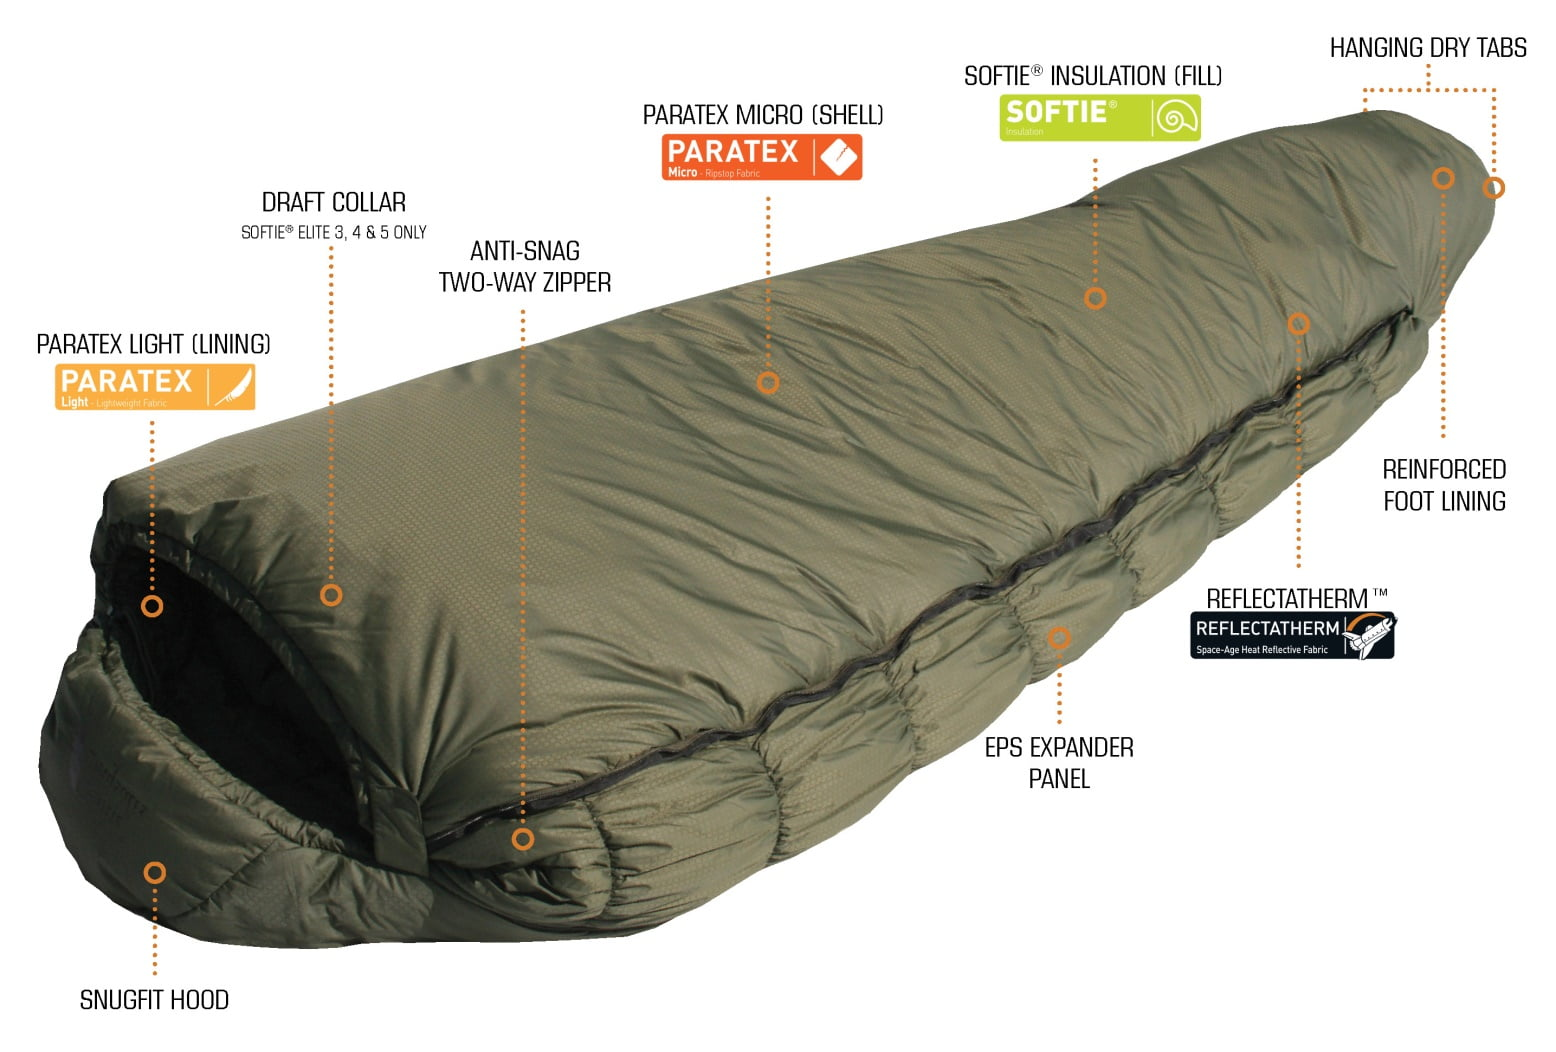 Snugpak Softie Elite 3 All Weather Sleeping Bag